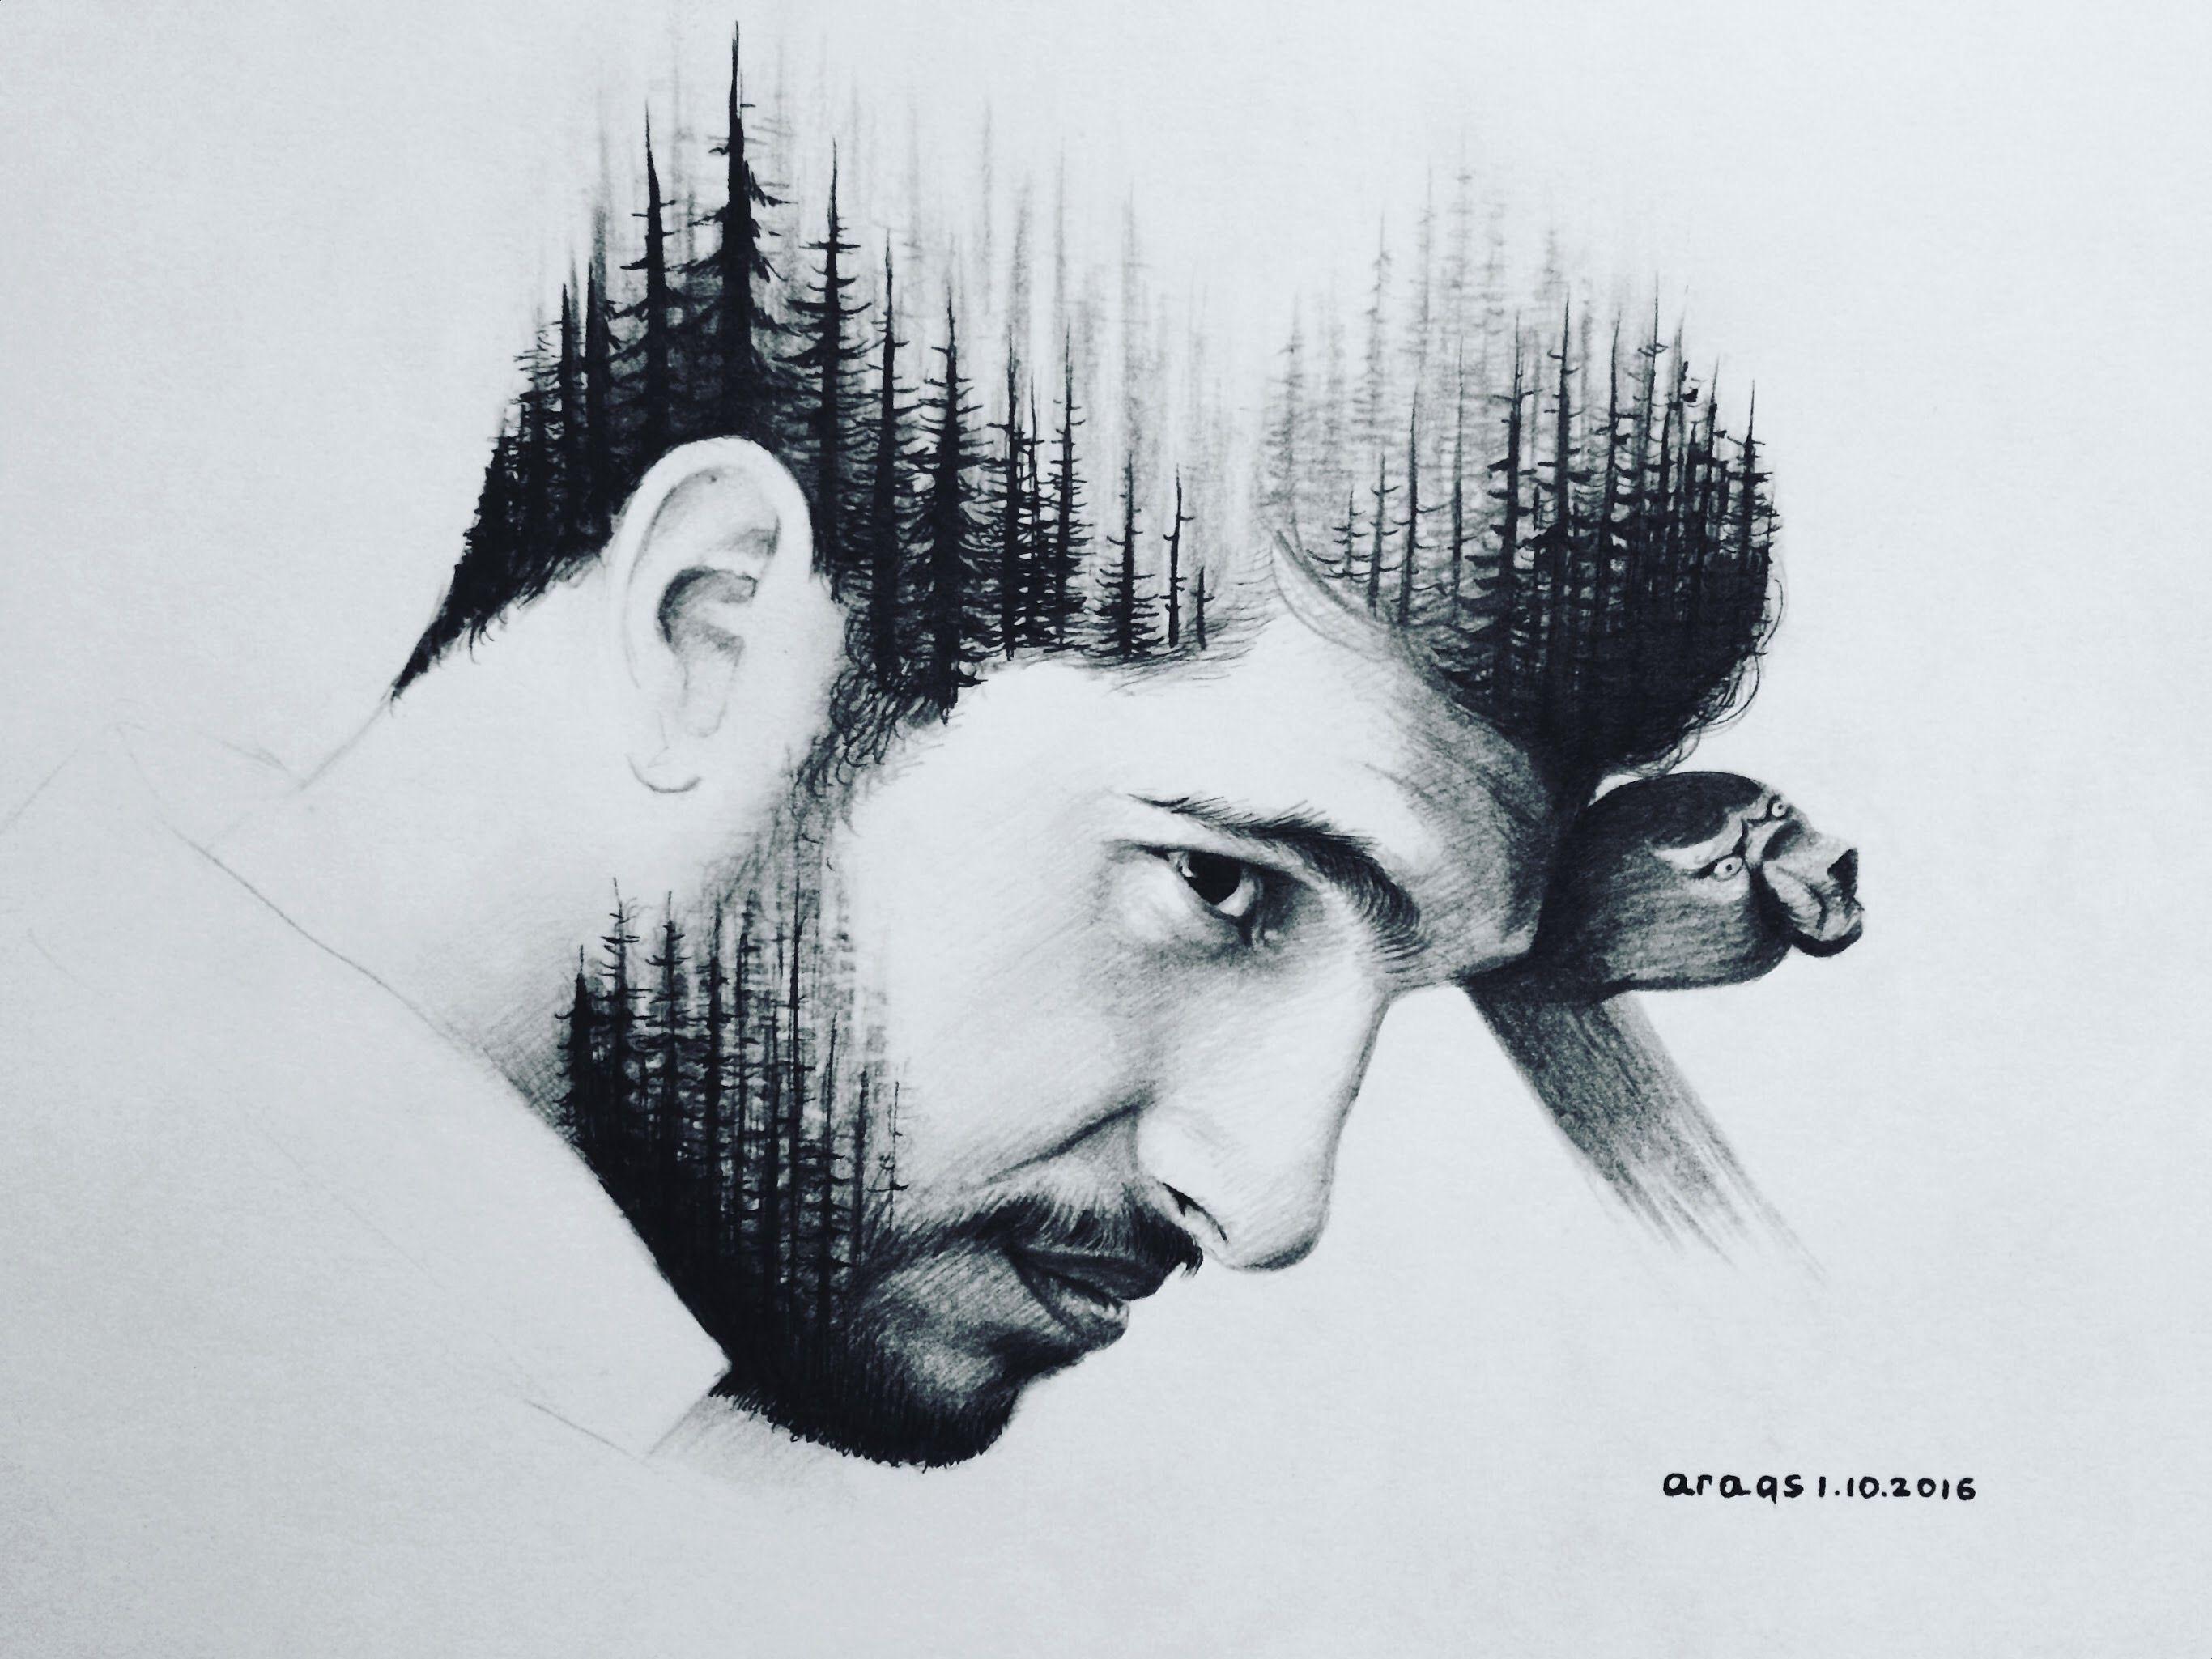 Portrait monochrome man portrait drawing black and white pencil ink double exposure effect drawn